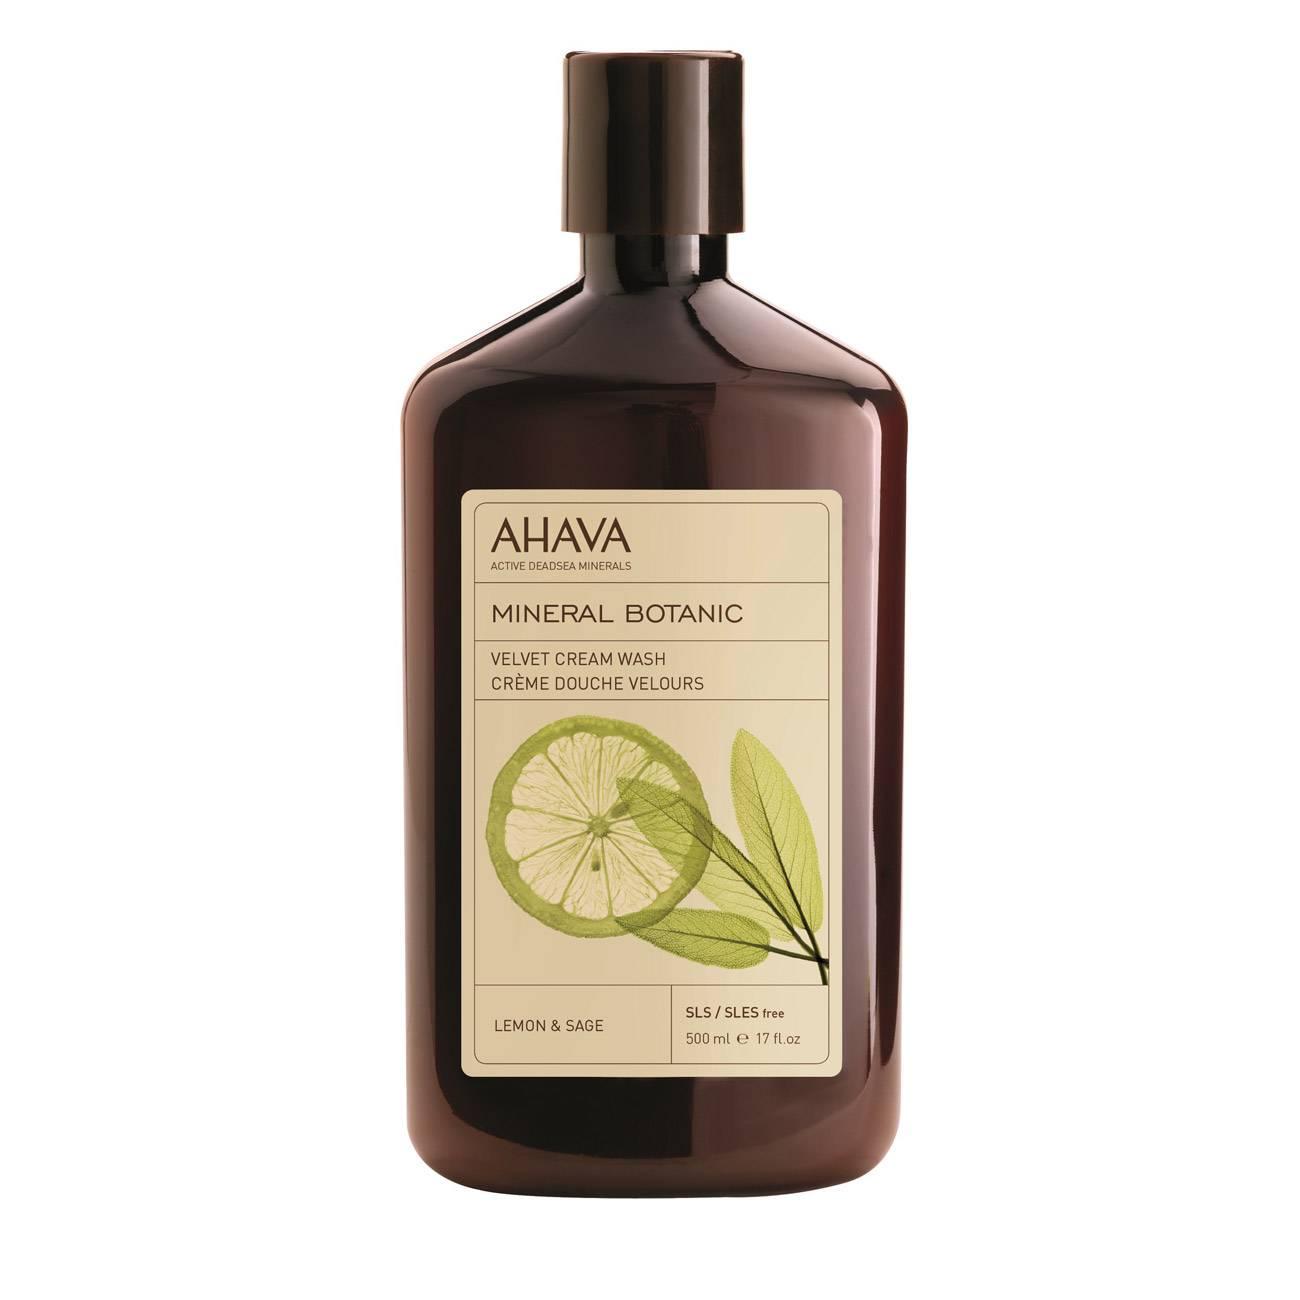 Mineral Botanic Cream Wash Lemon & Sage 500 Ml Ahava imagine 2021 bestvalue.eu